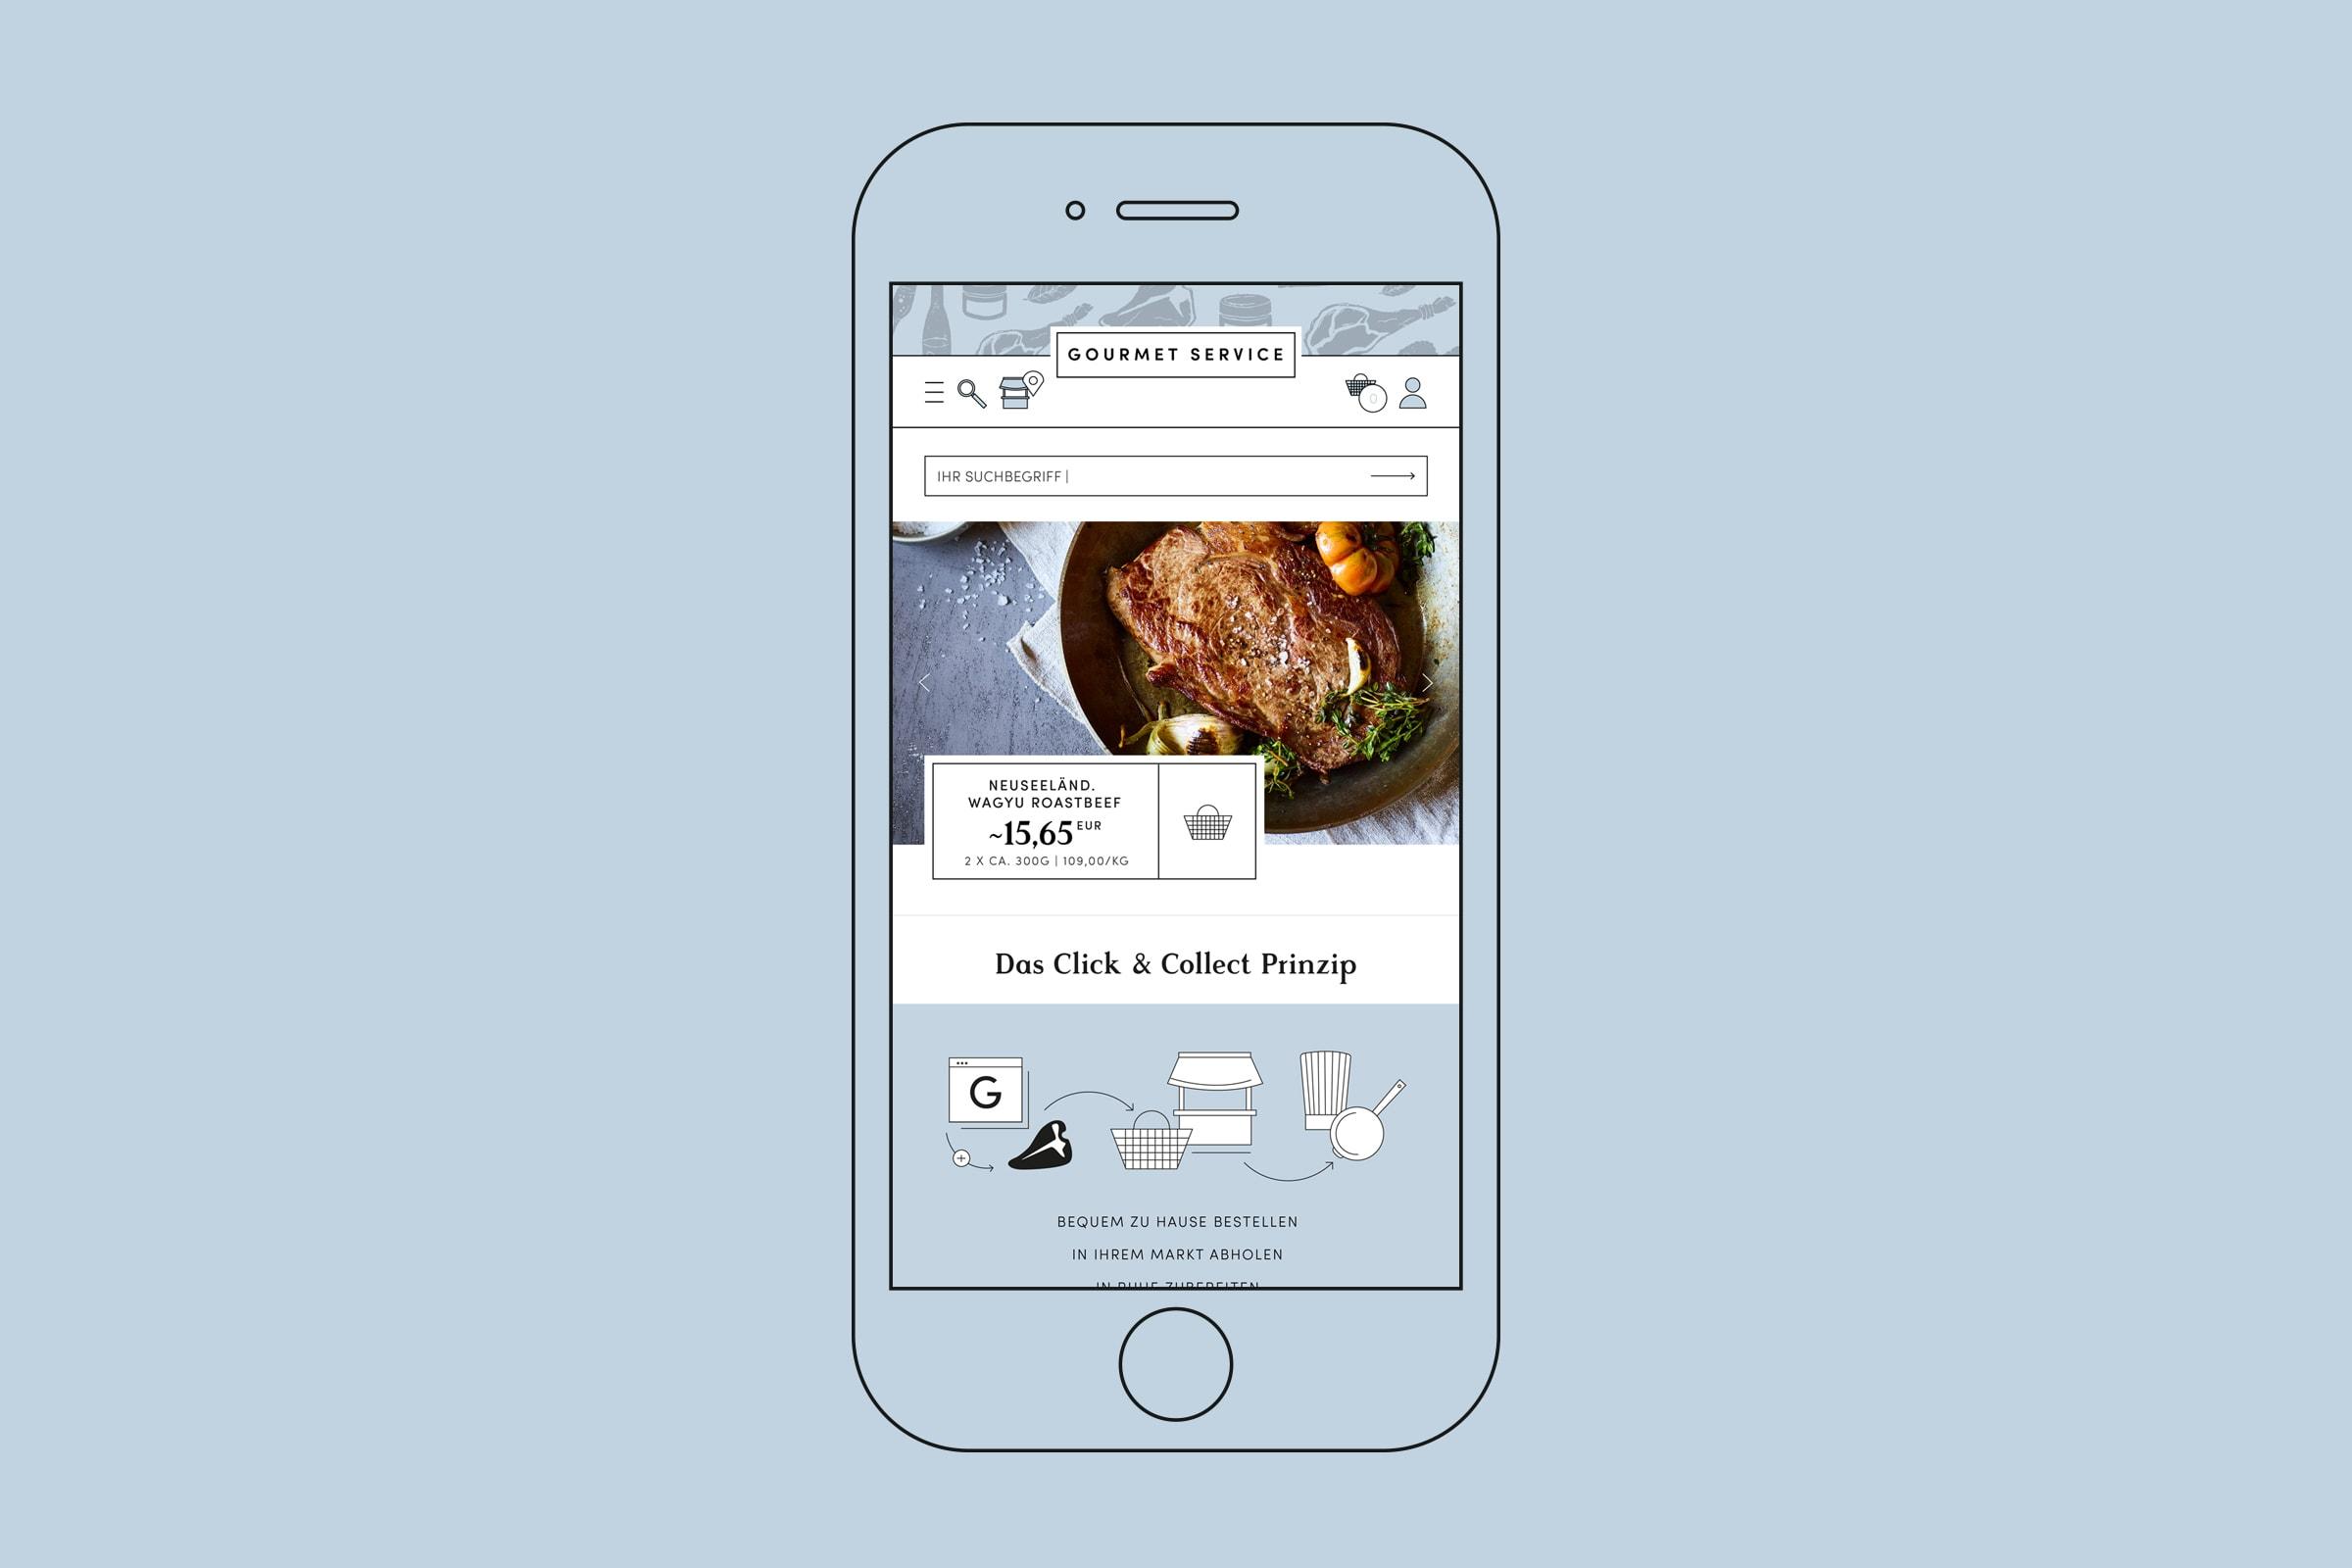 Webdesign, Mobil, Responsive Design, iPhone, Corporate Design, Essen, Food, Lebensmittel, Gourmet